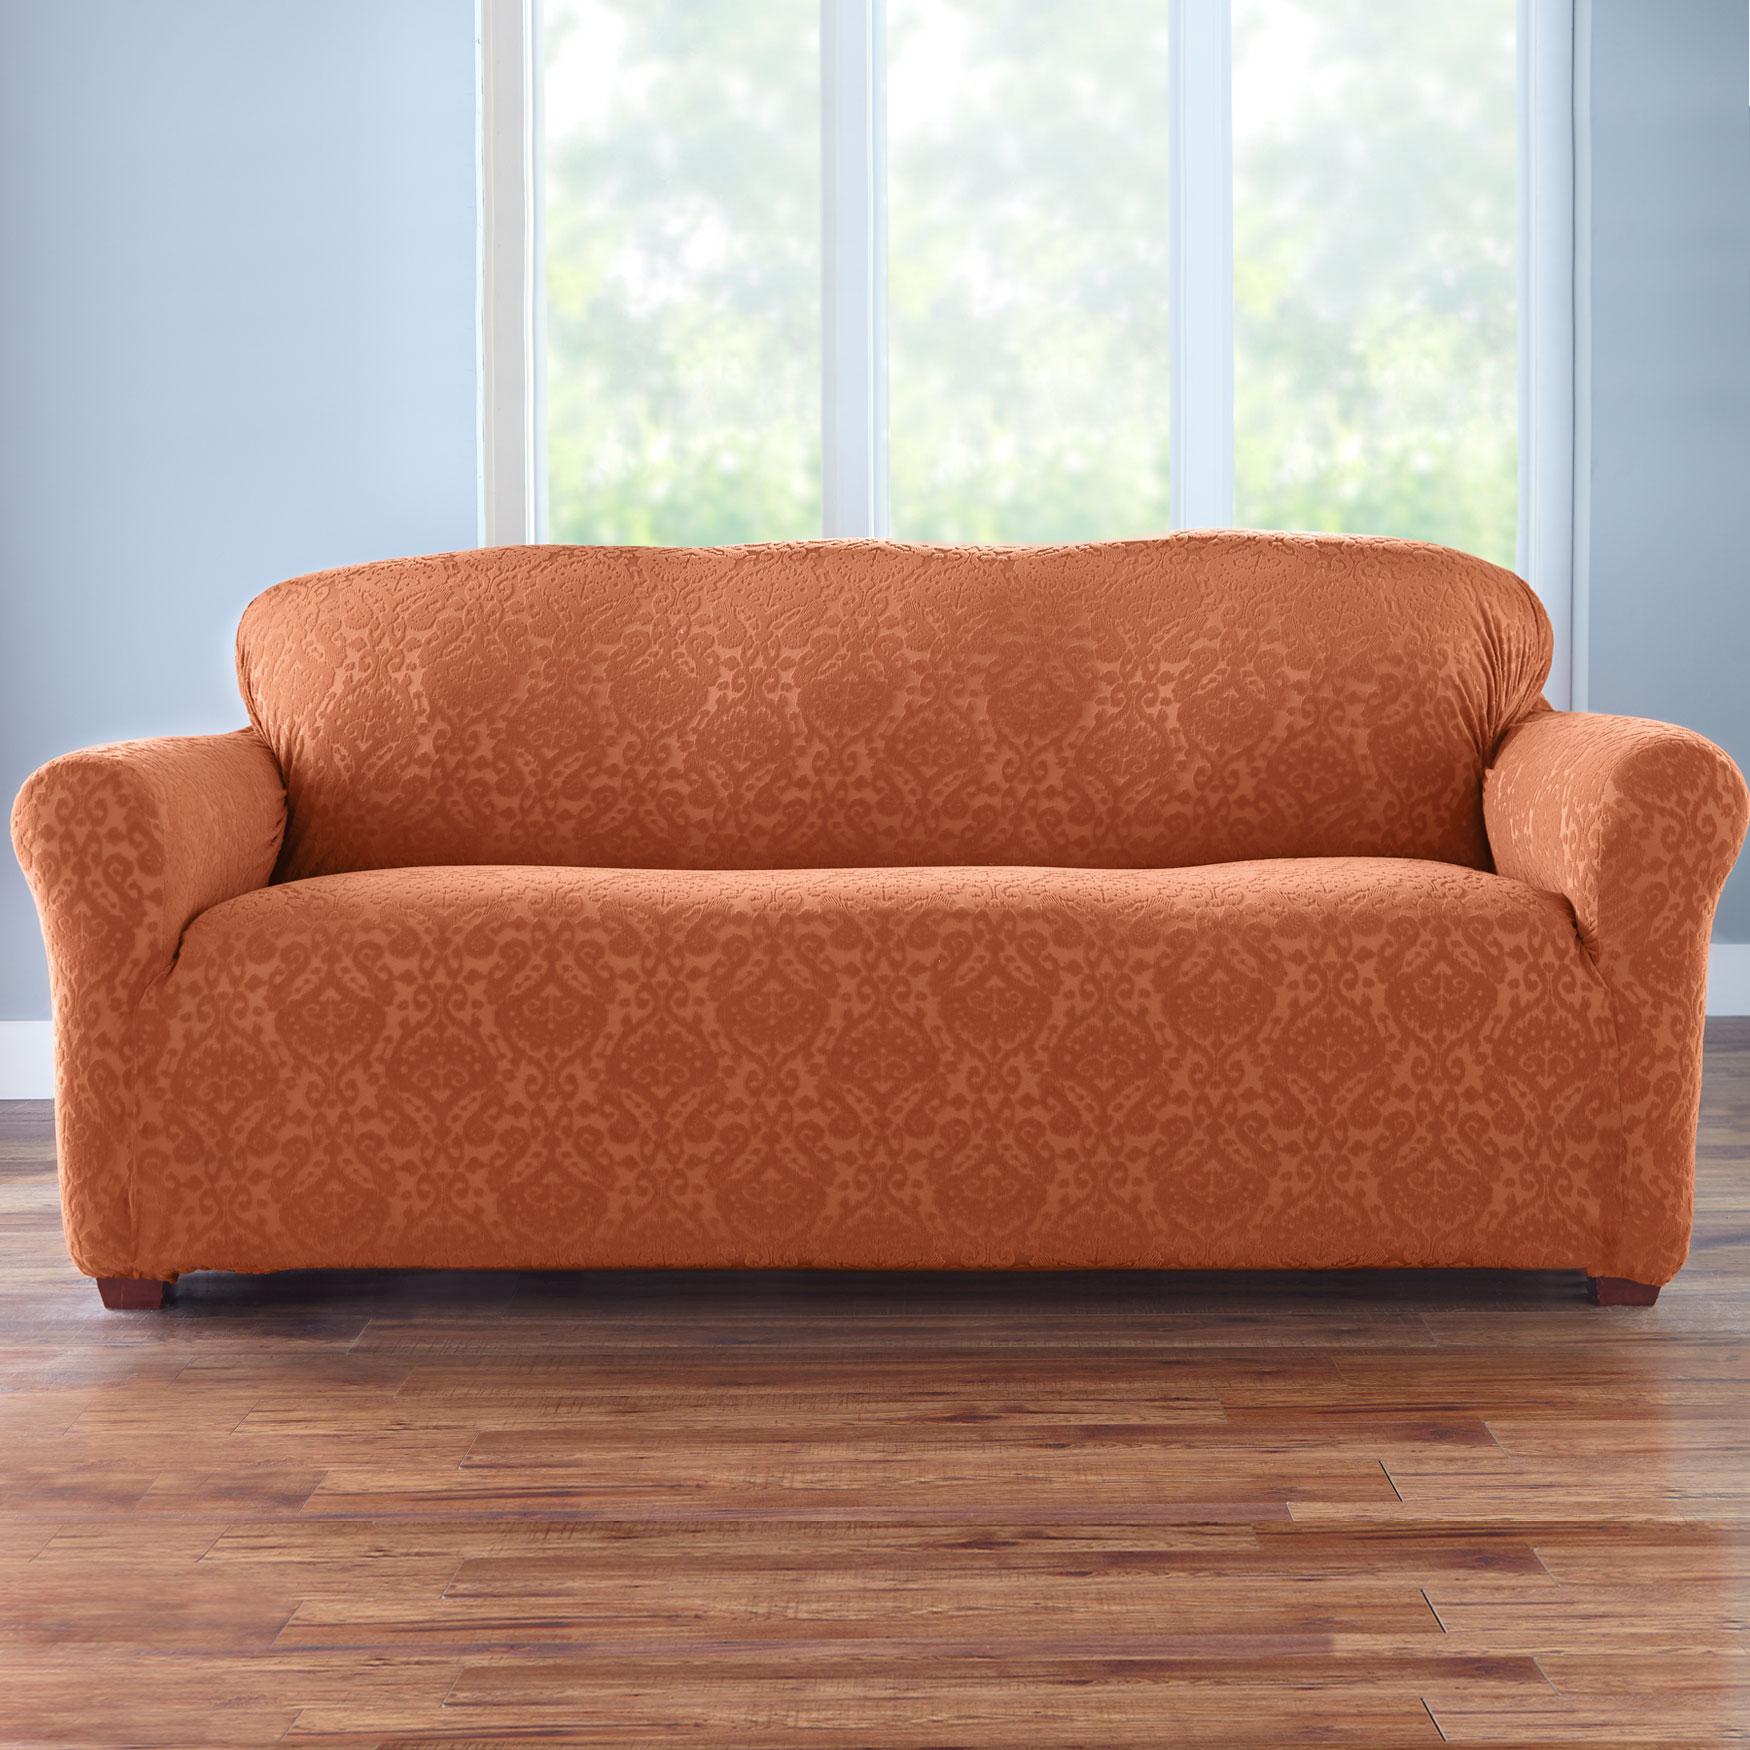 Bh Studio Ikat Stretch Sofa Slipcover